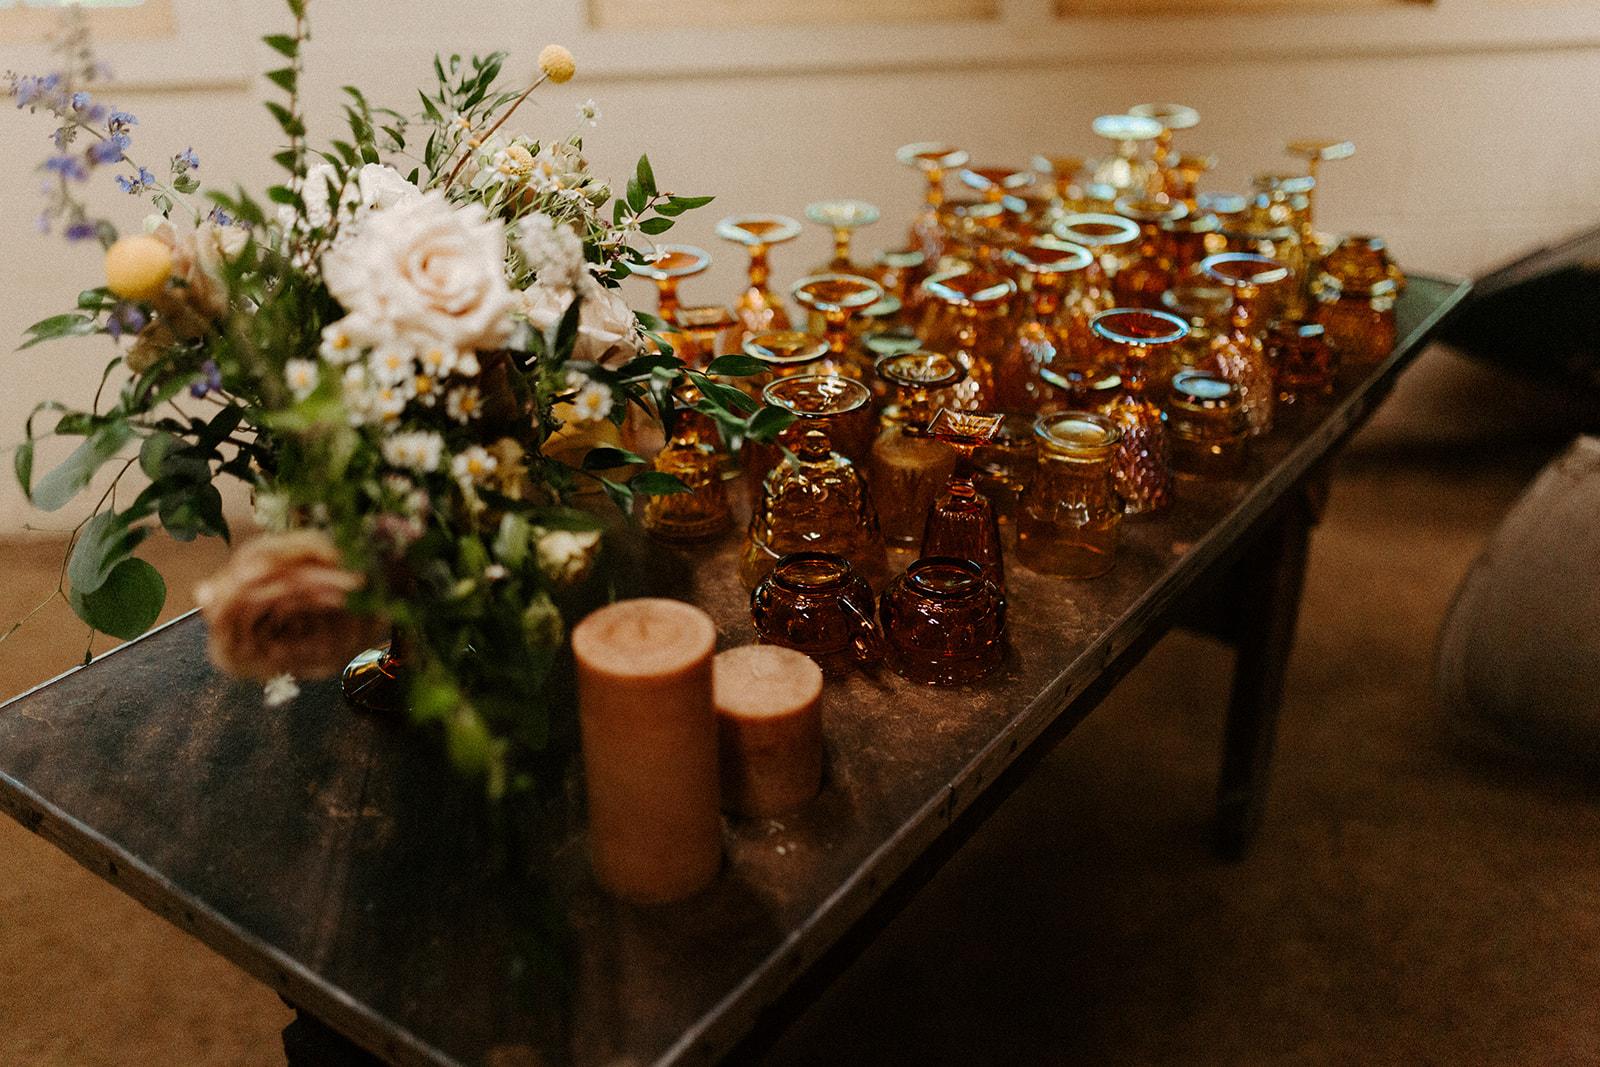 camp_wokanda_peoria_illinois_wedding_photographer_wright_photographs_bliese_0849.jpg